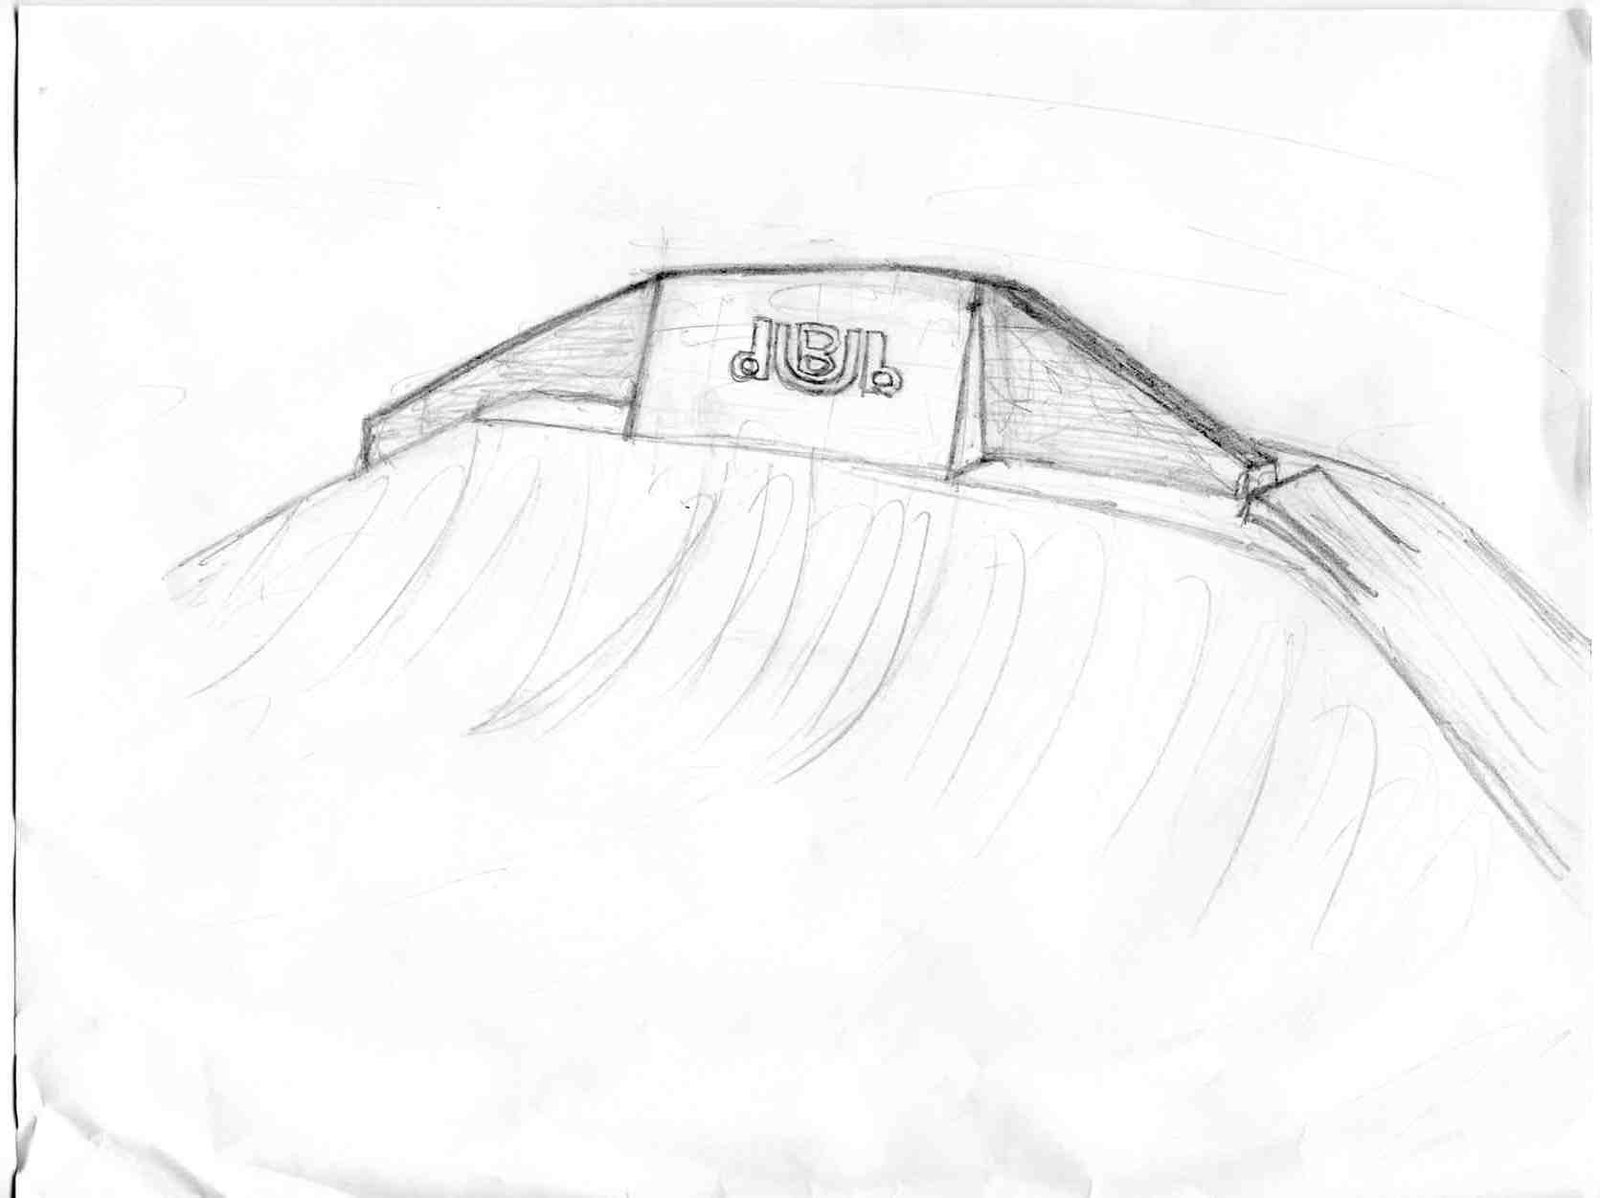 Wall Ride Jib